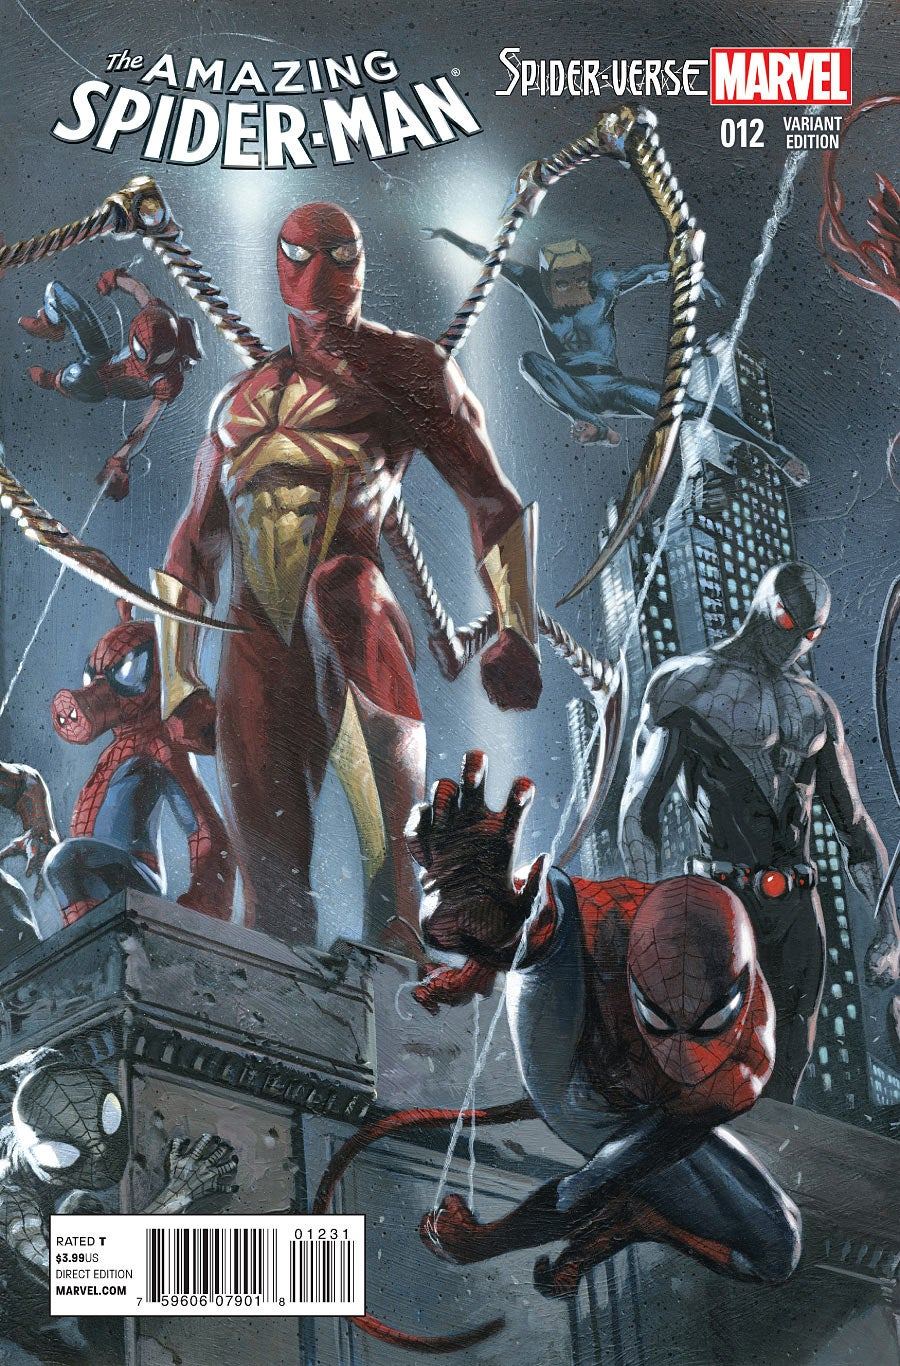 12 Amazing Tattoo Designs For Shoulder Blade: [SPOILER] Returns In Amazing Spider-Man #12